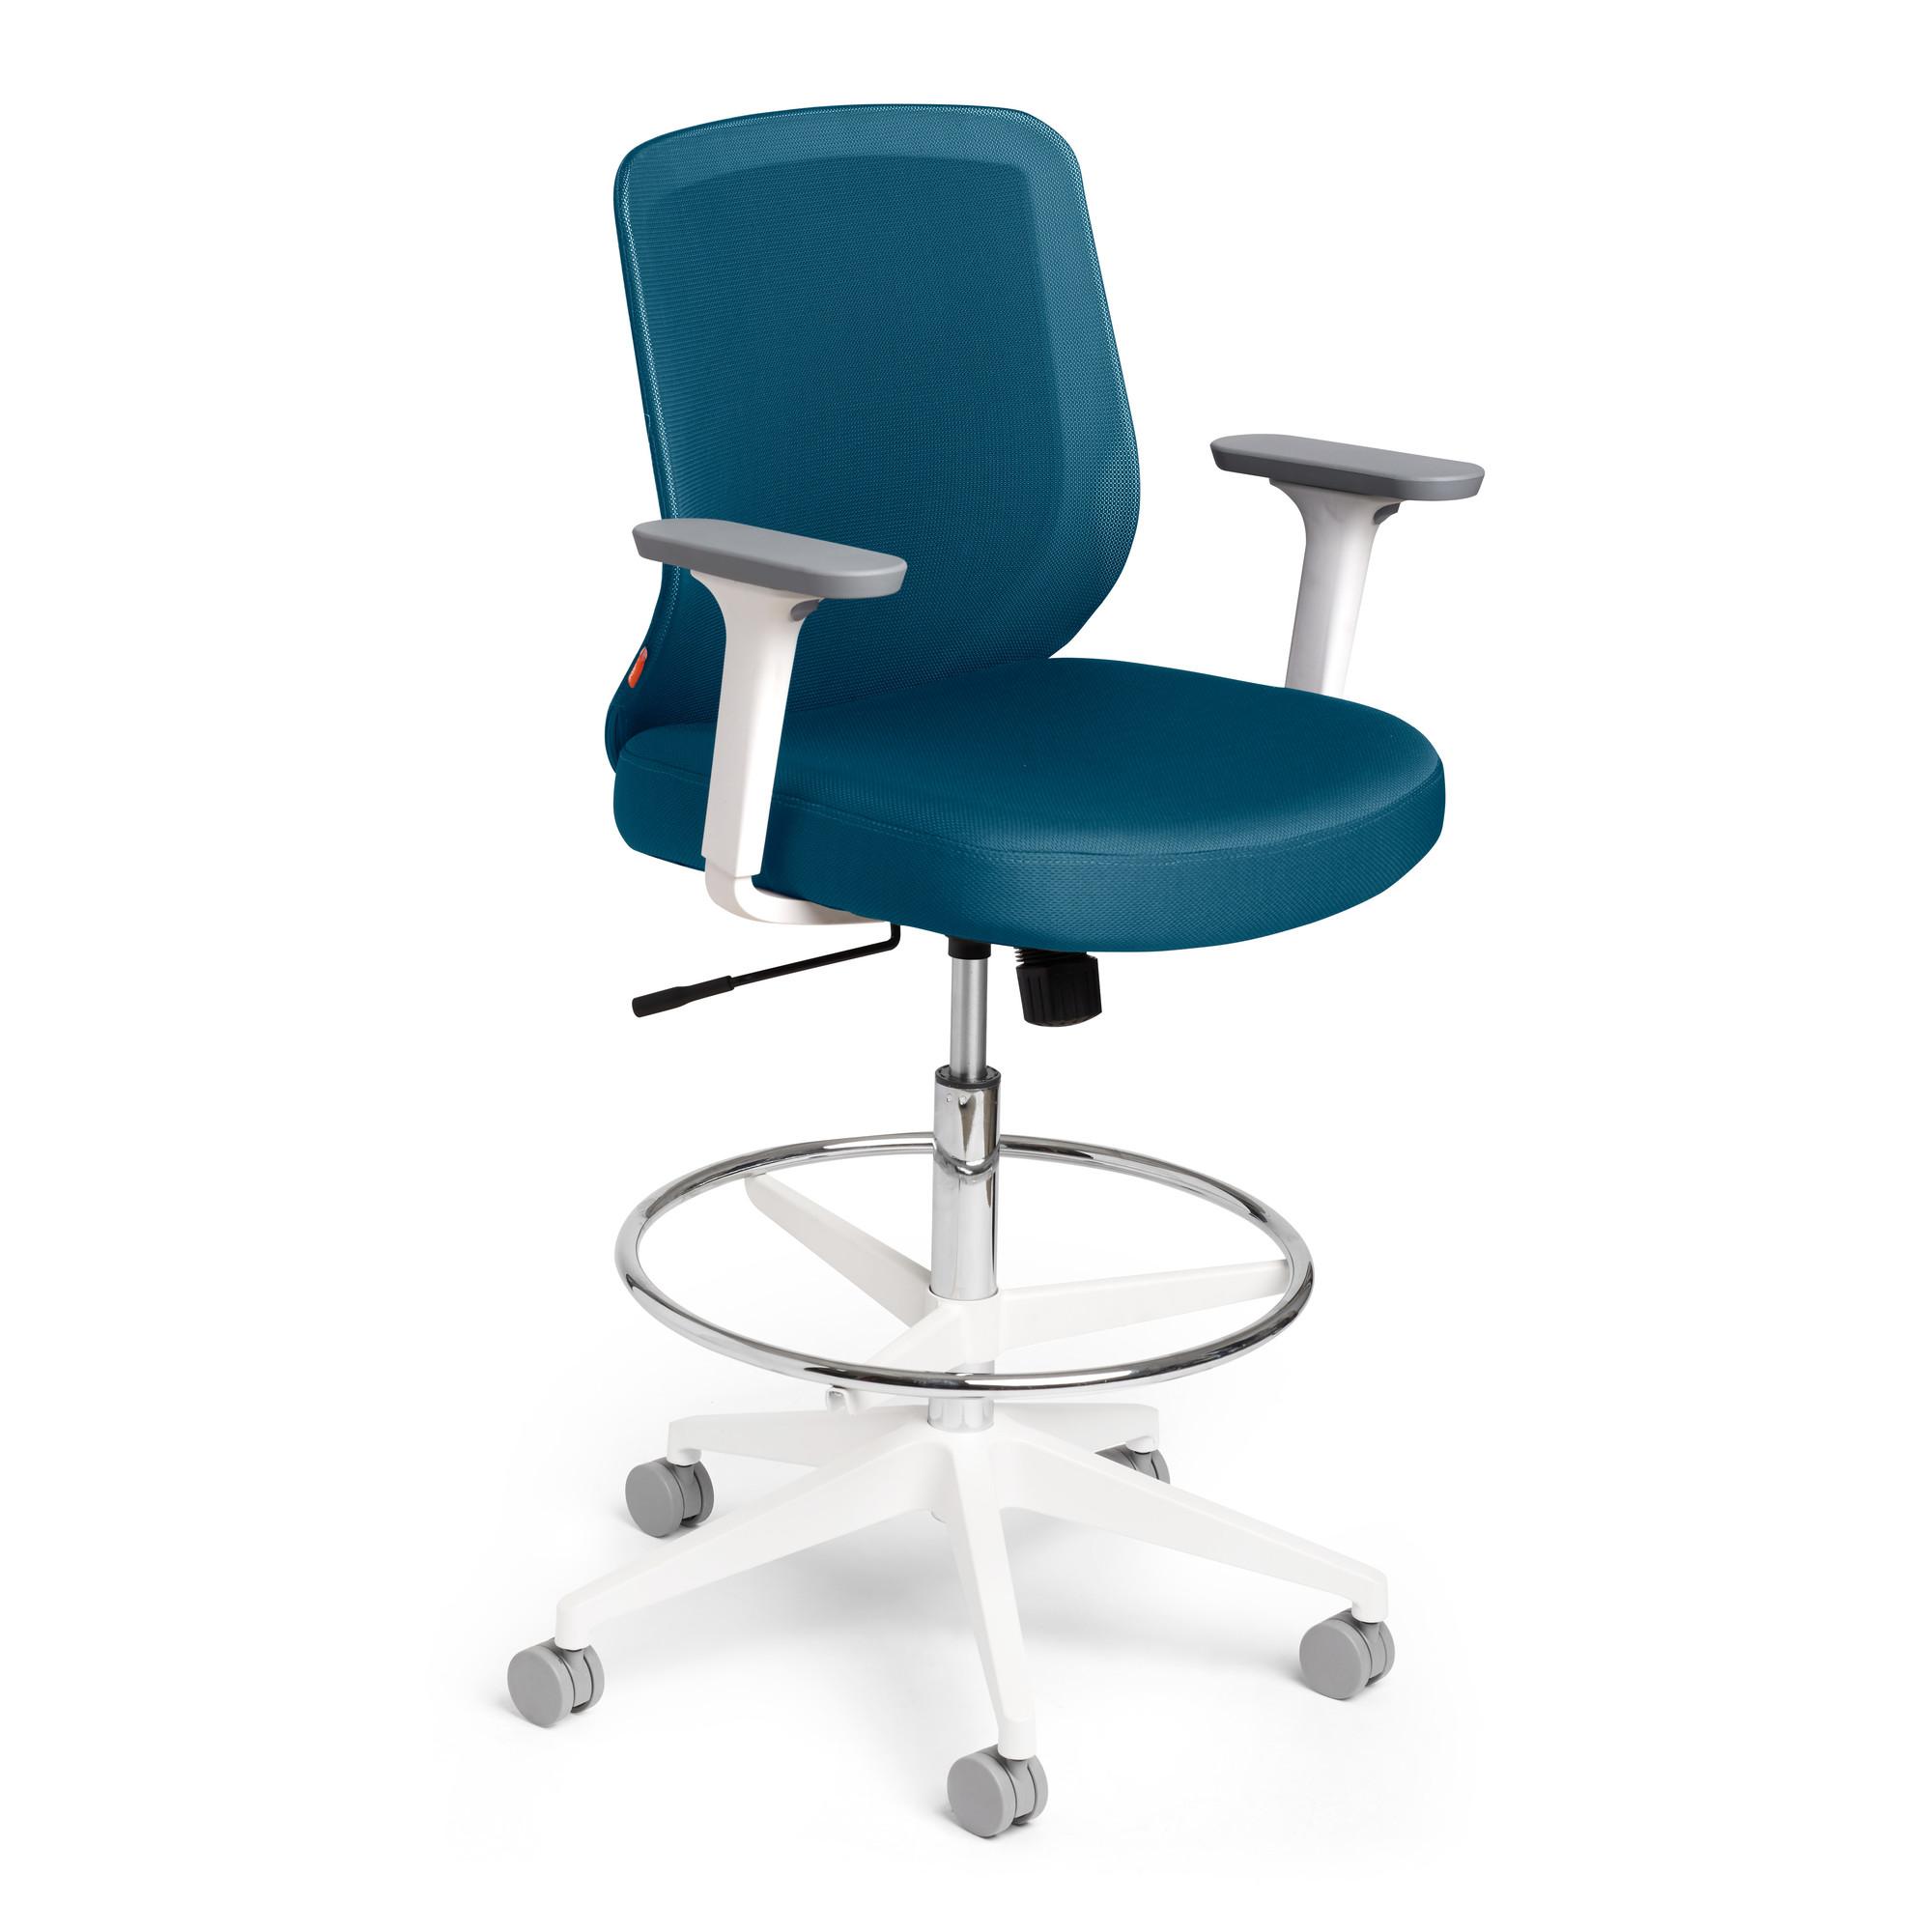 modern drafting chair. Slate Blue Max Drafting Chair, Mid Back, White Frame,Slate Blue,hi Modern Chair H